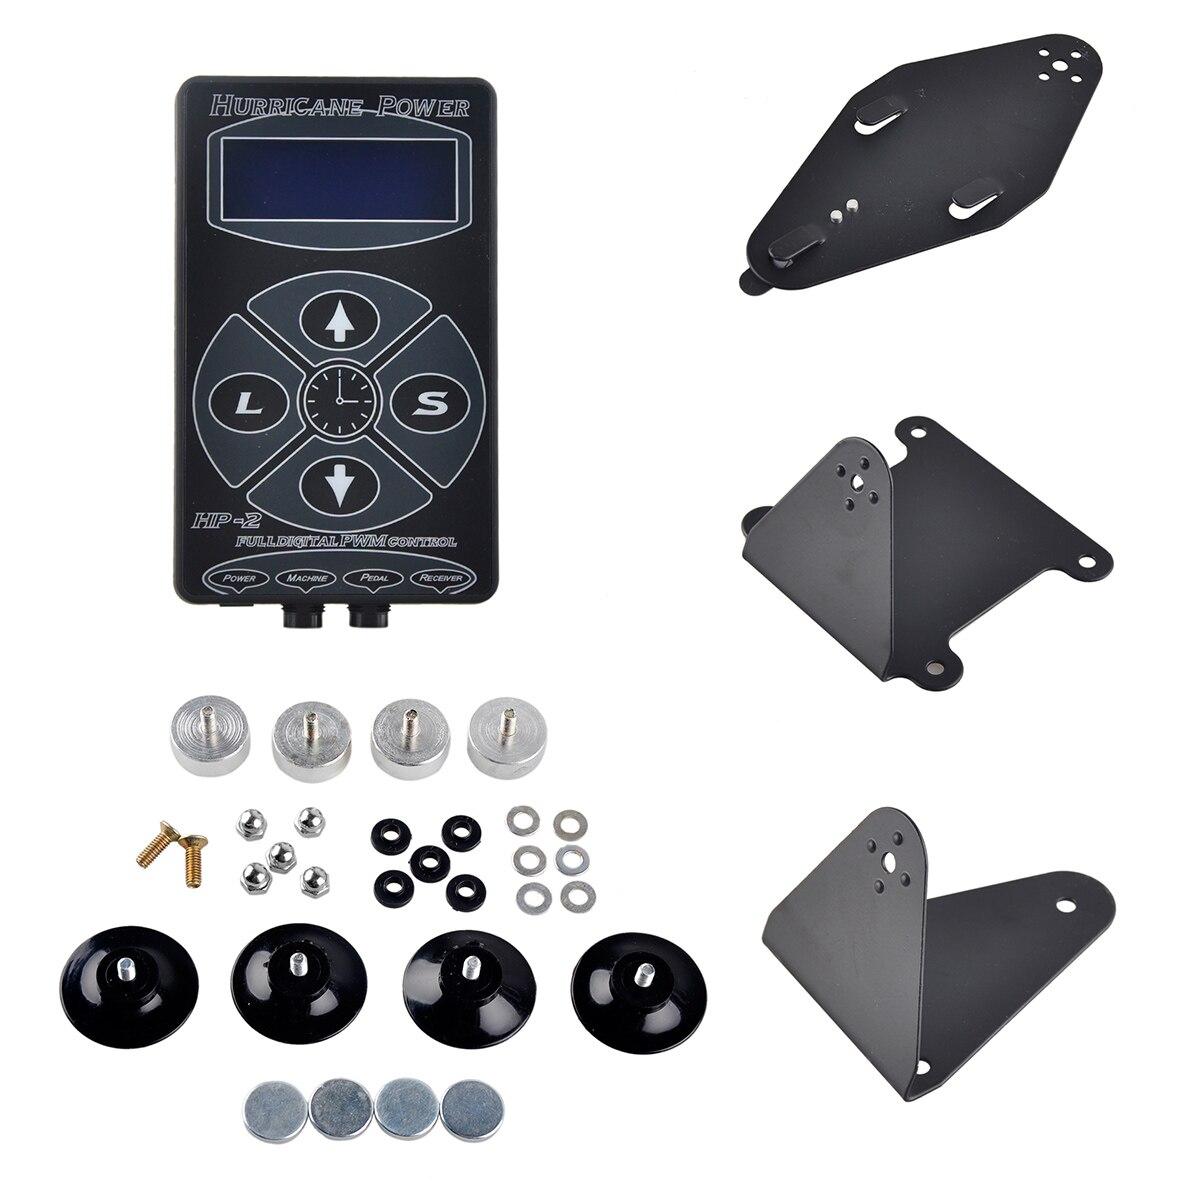 Tattoo Power Supply Digital Power HP-2 LCD Display Black/Silver/White For Kits Machine